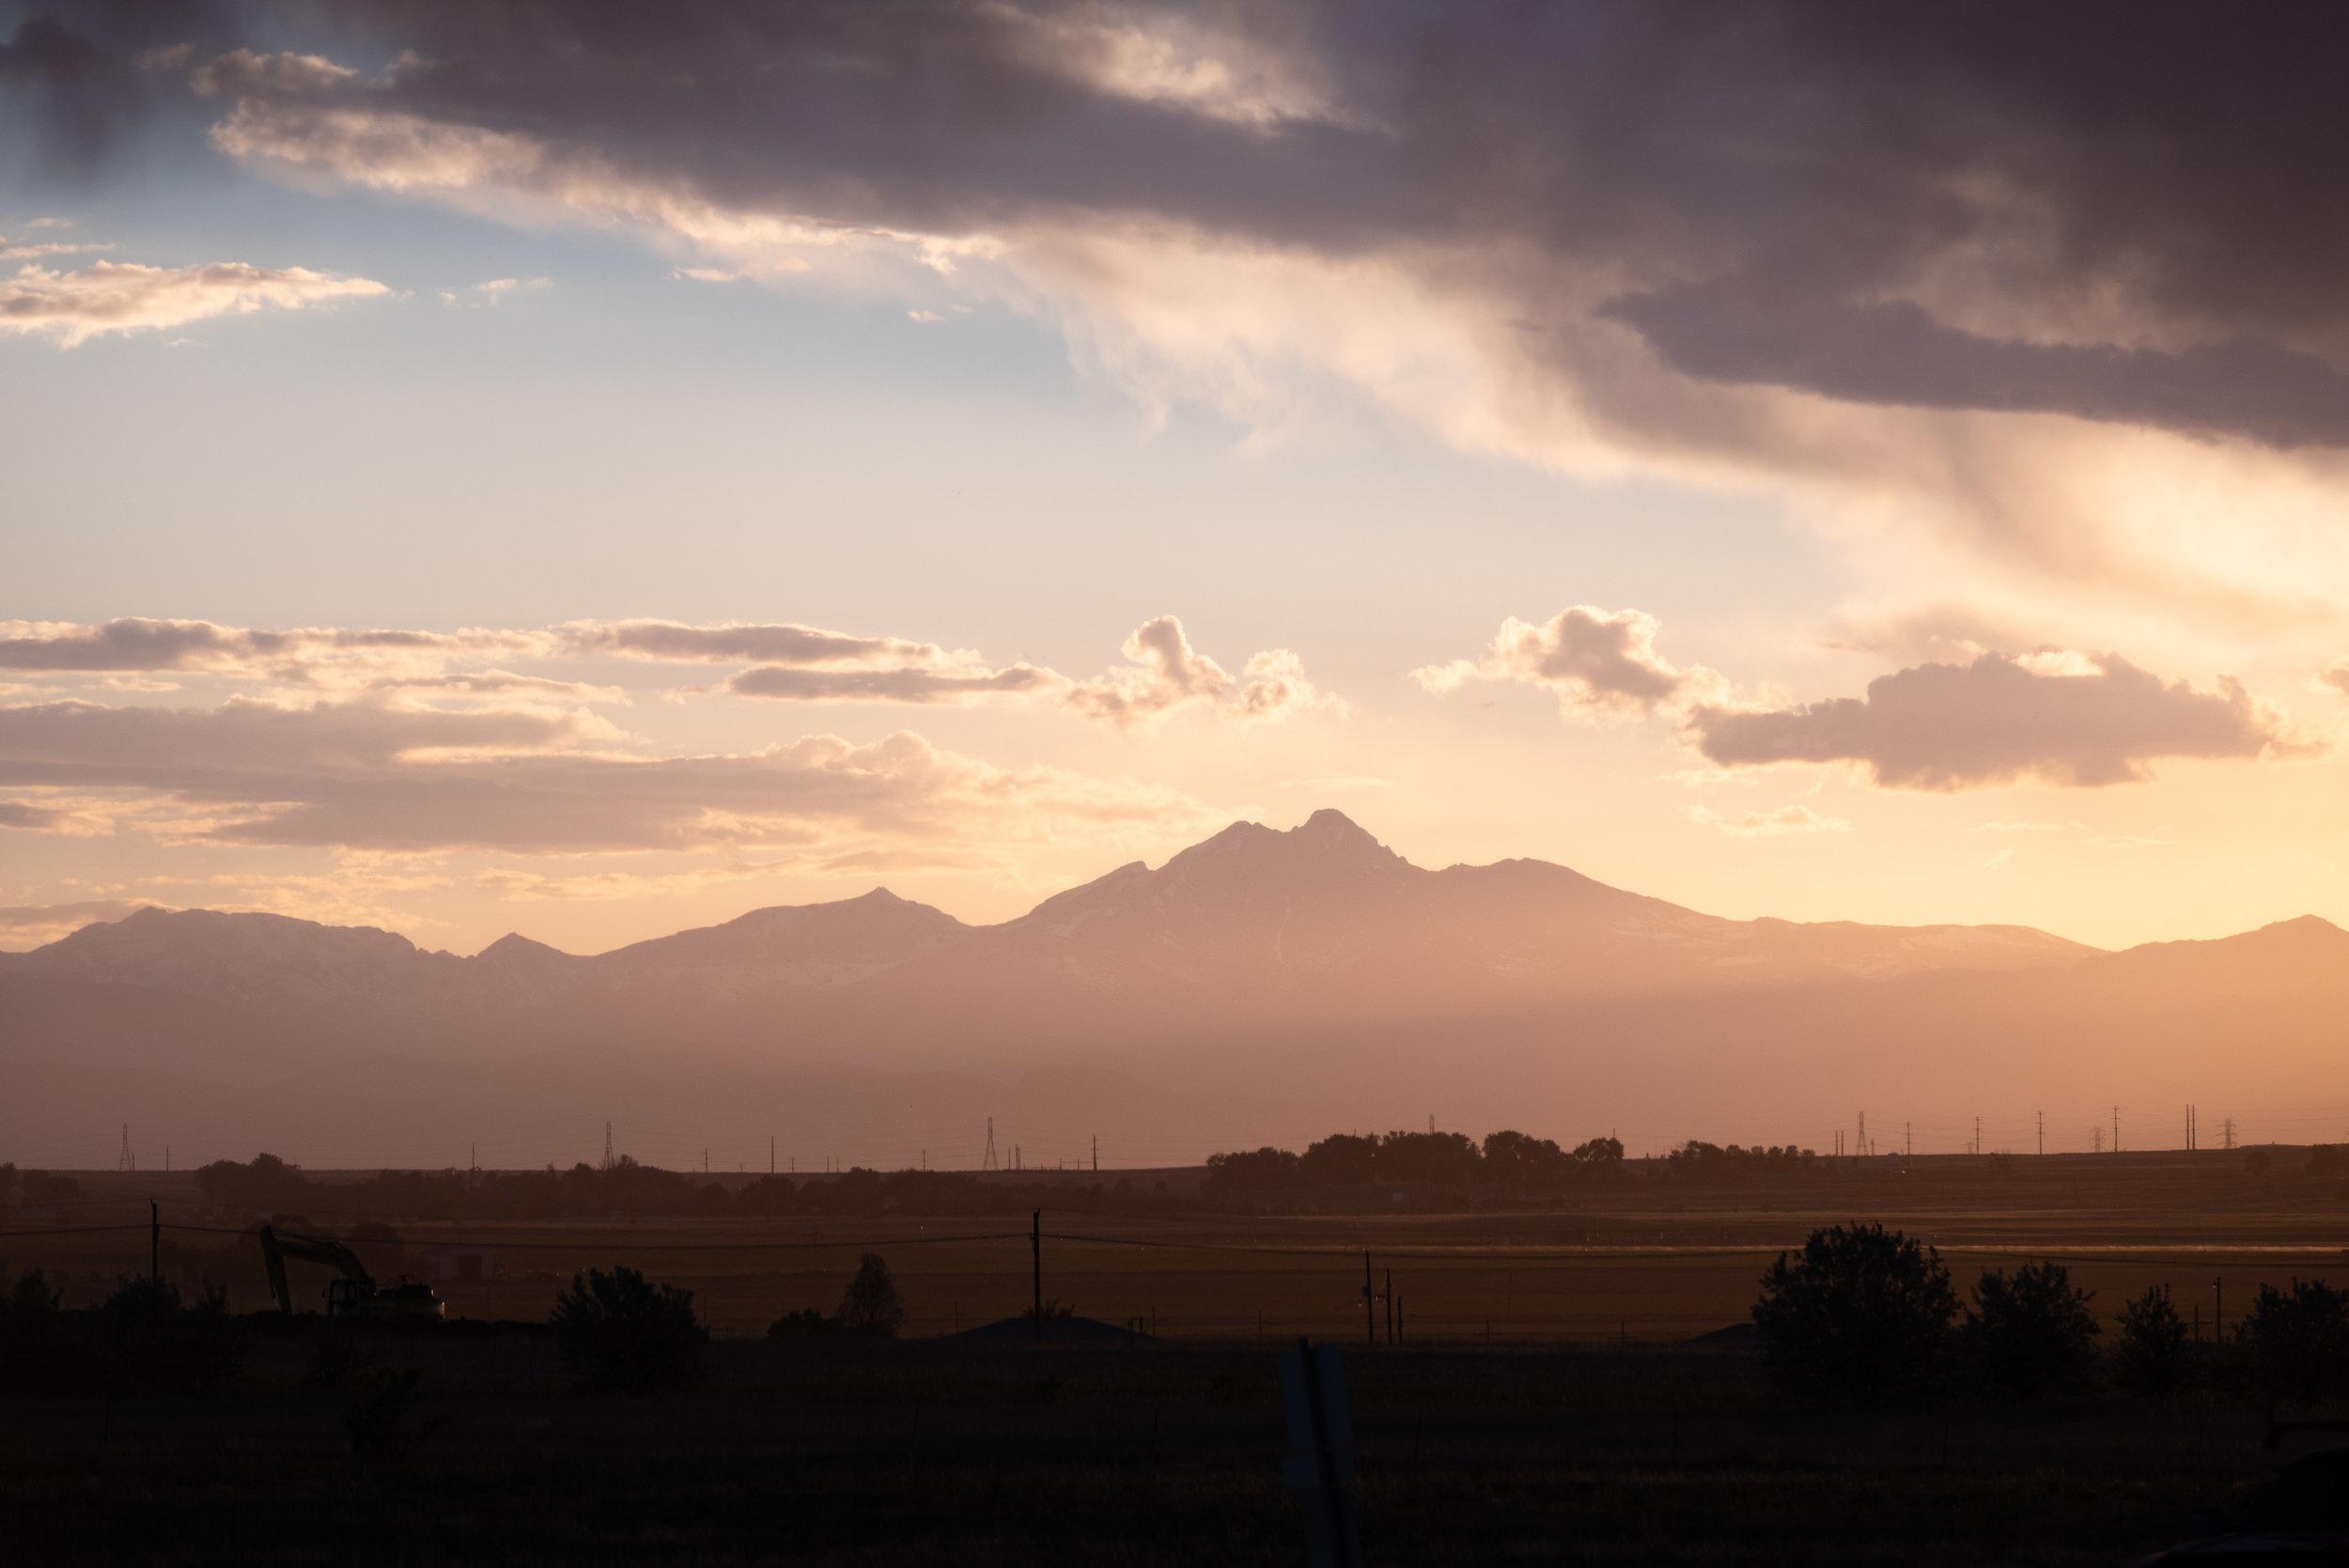 Colorado - United States